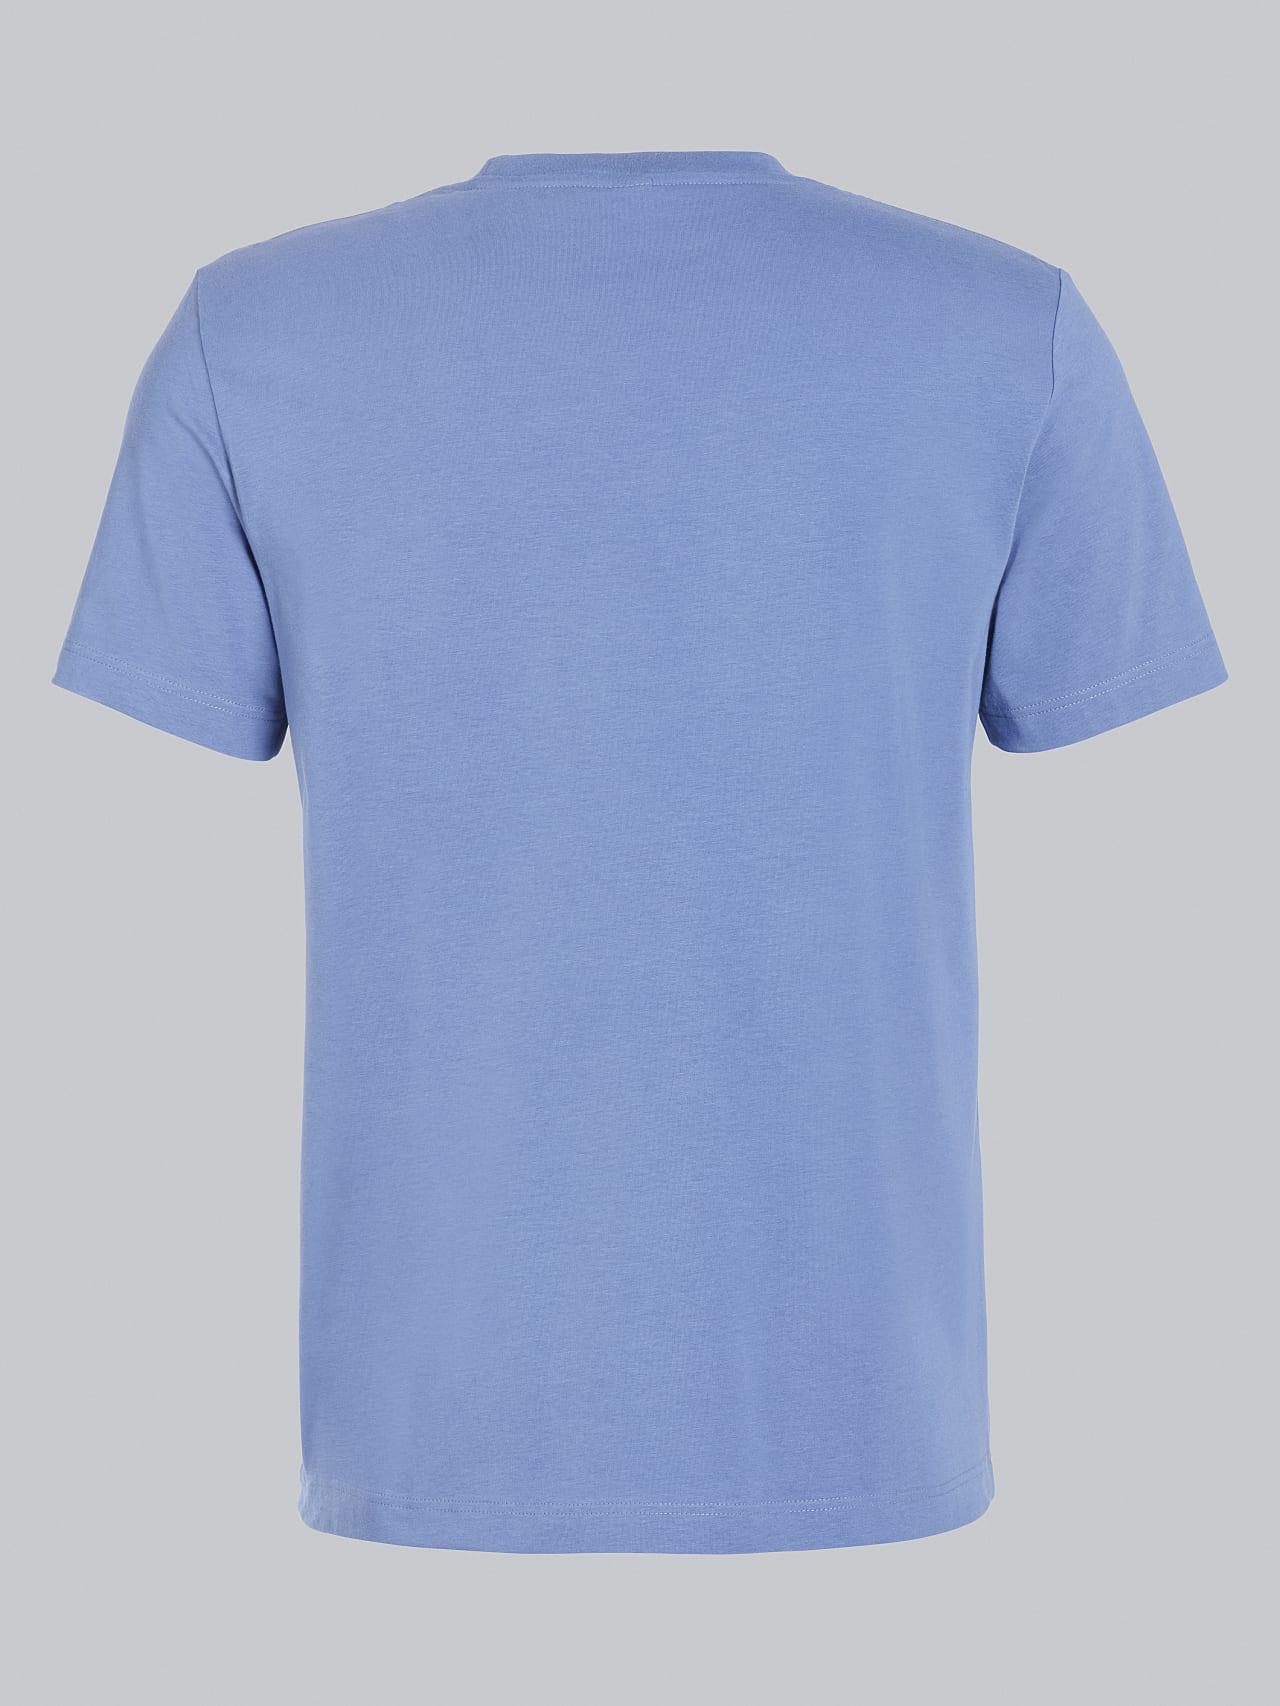 JANOS V3.Y5.02 Logo Embroidery T-Shirt light blue Left Alpha Tauri